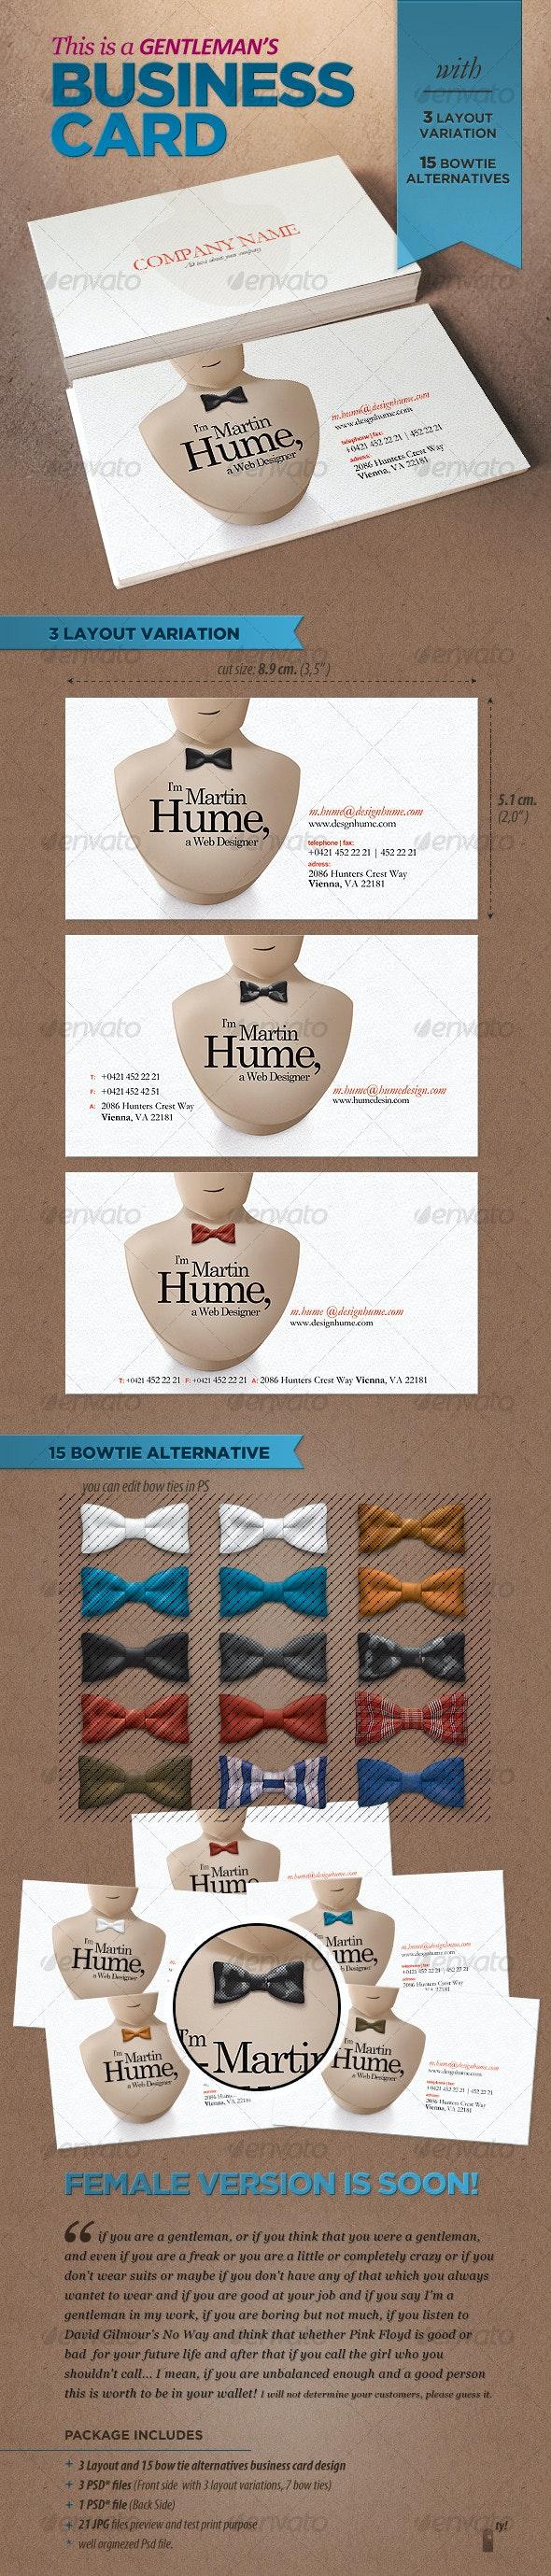 Gentleman's Business Card - Creative Business Cards